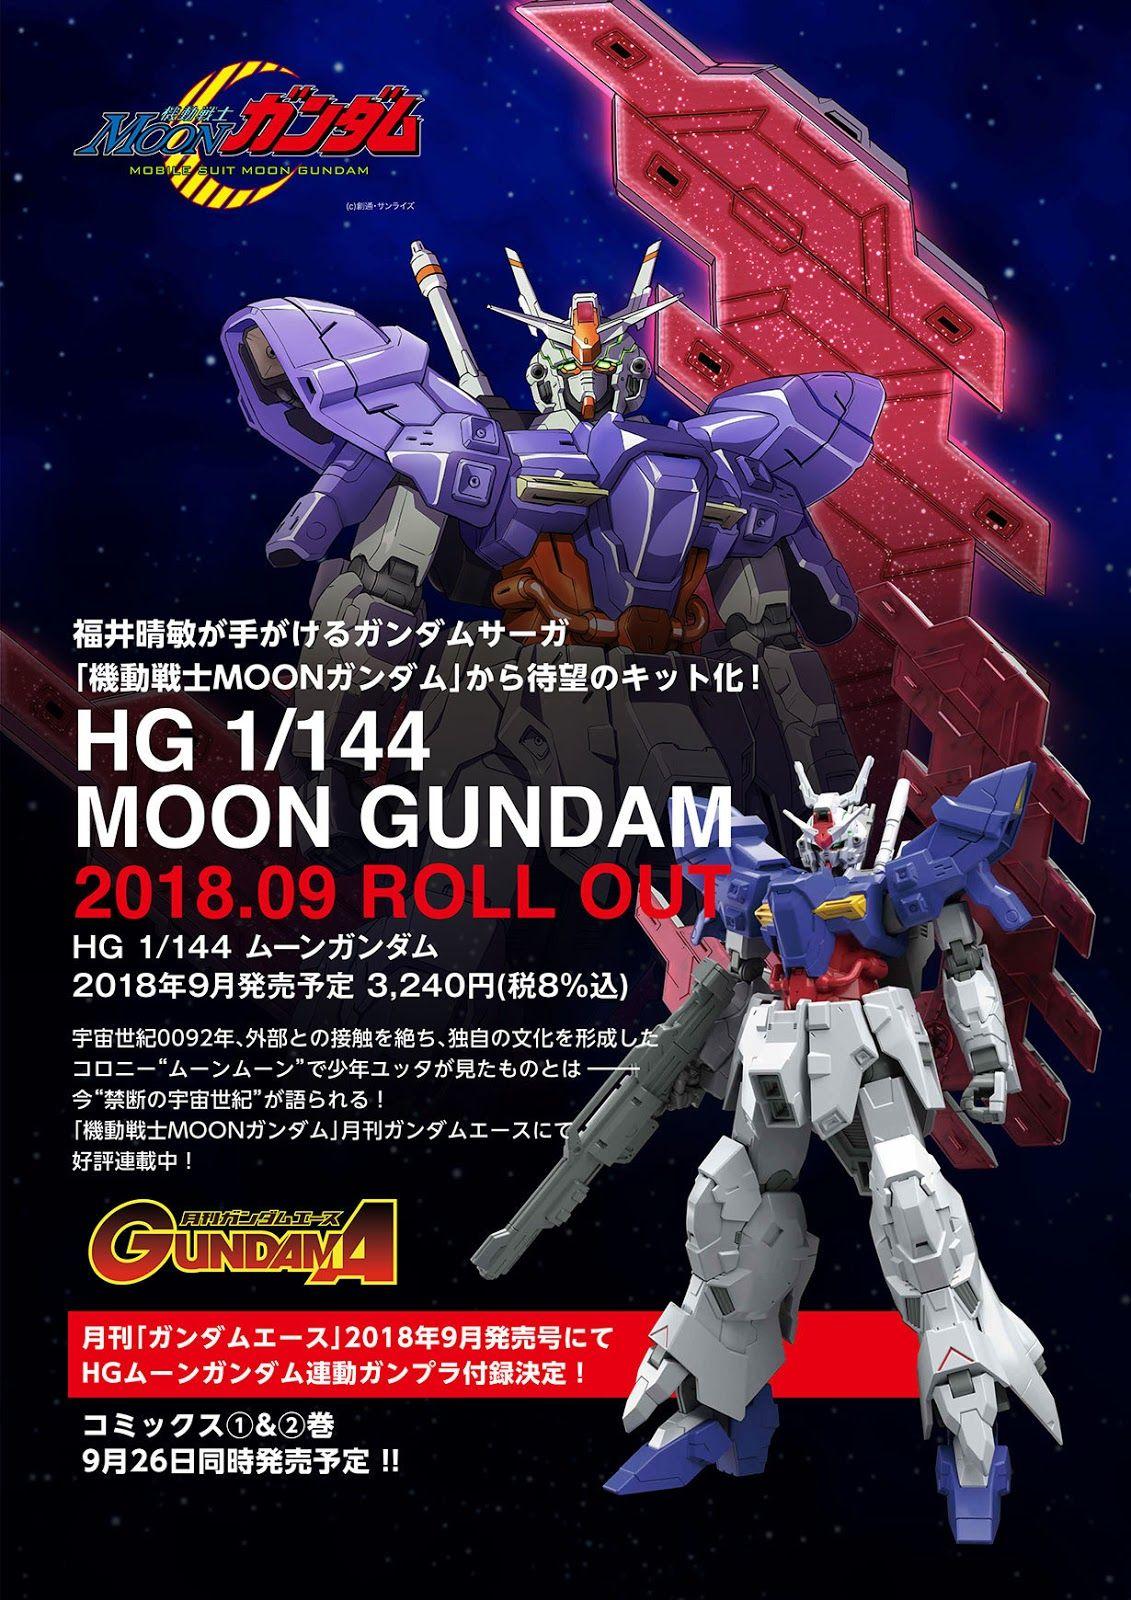 HGUC 1/144 Moon Gundam Release Info, Box art and